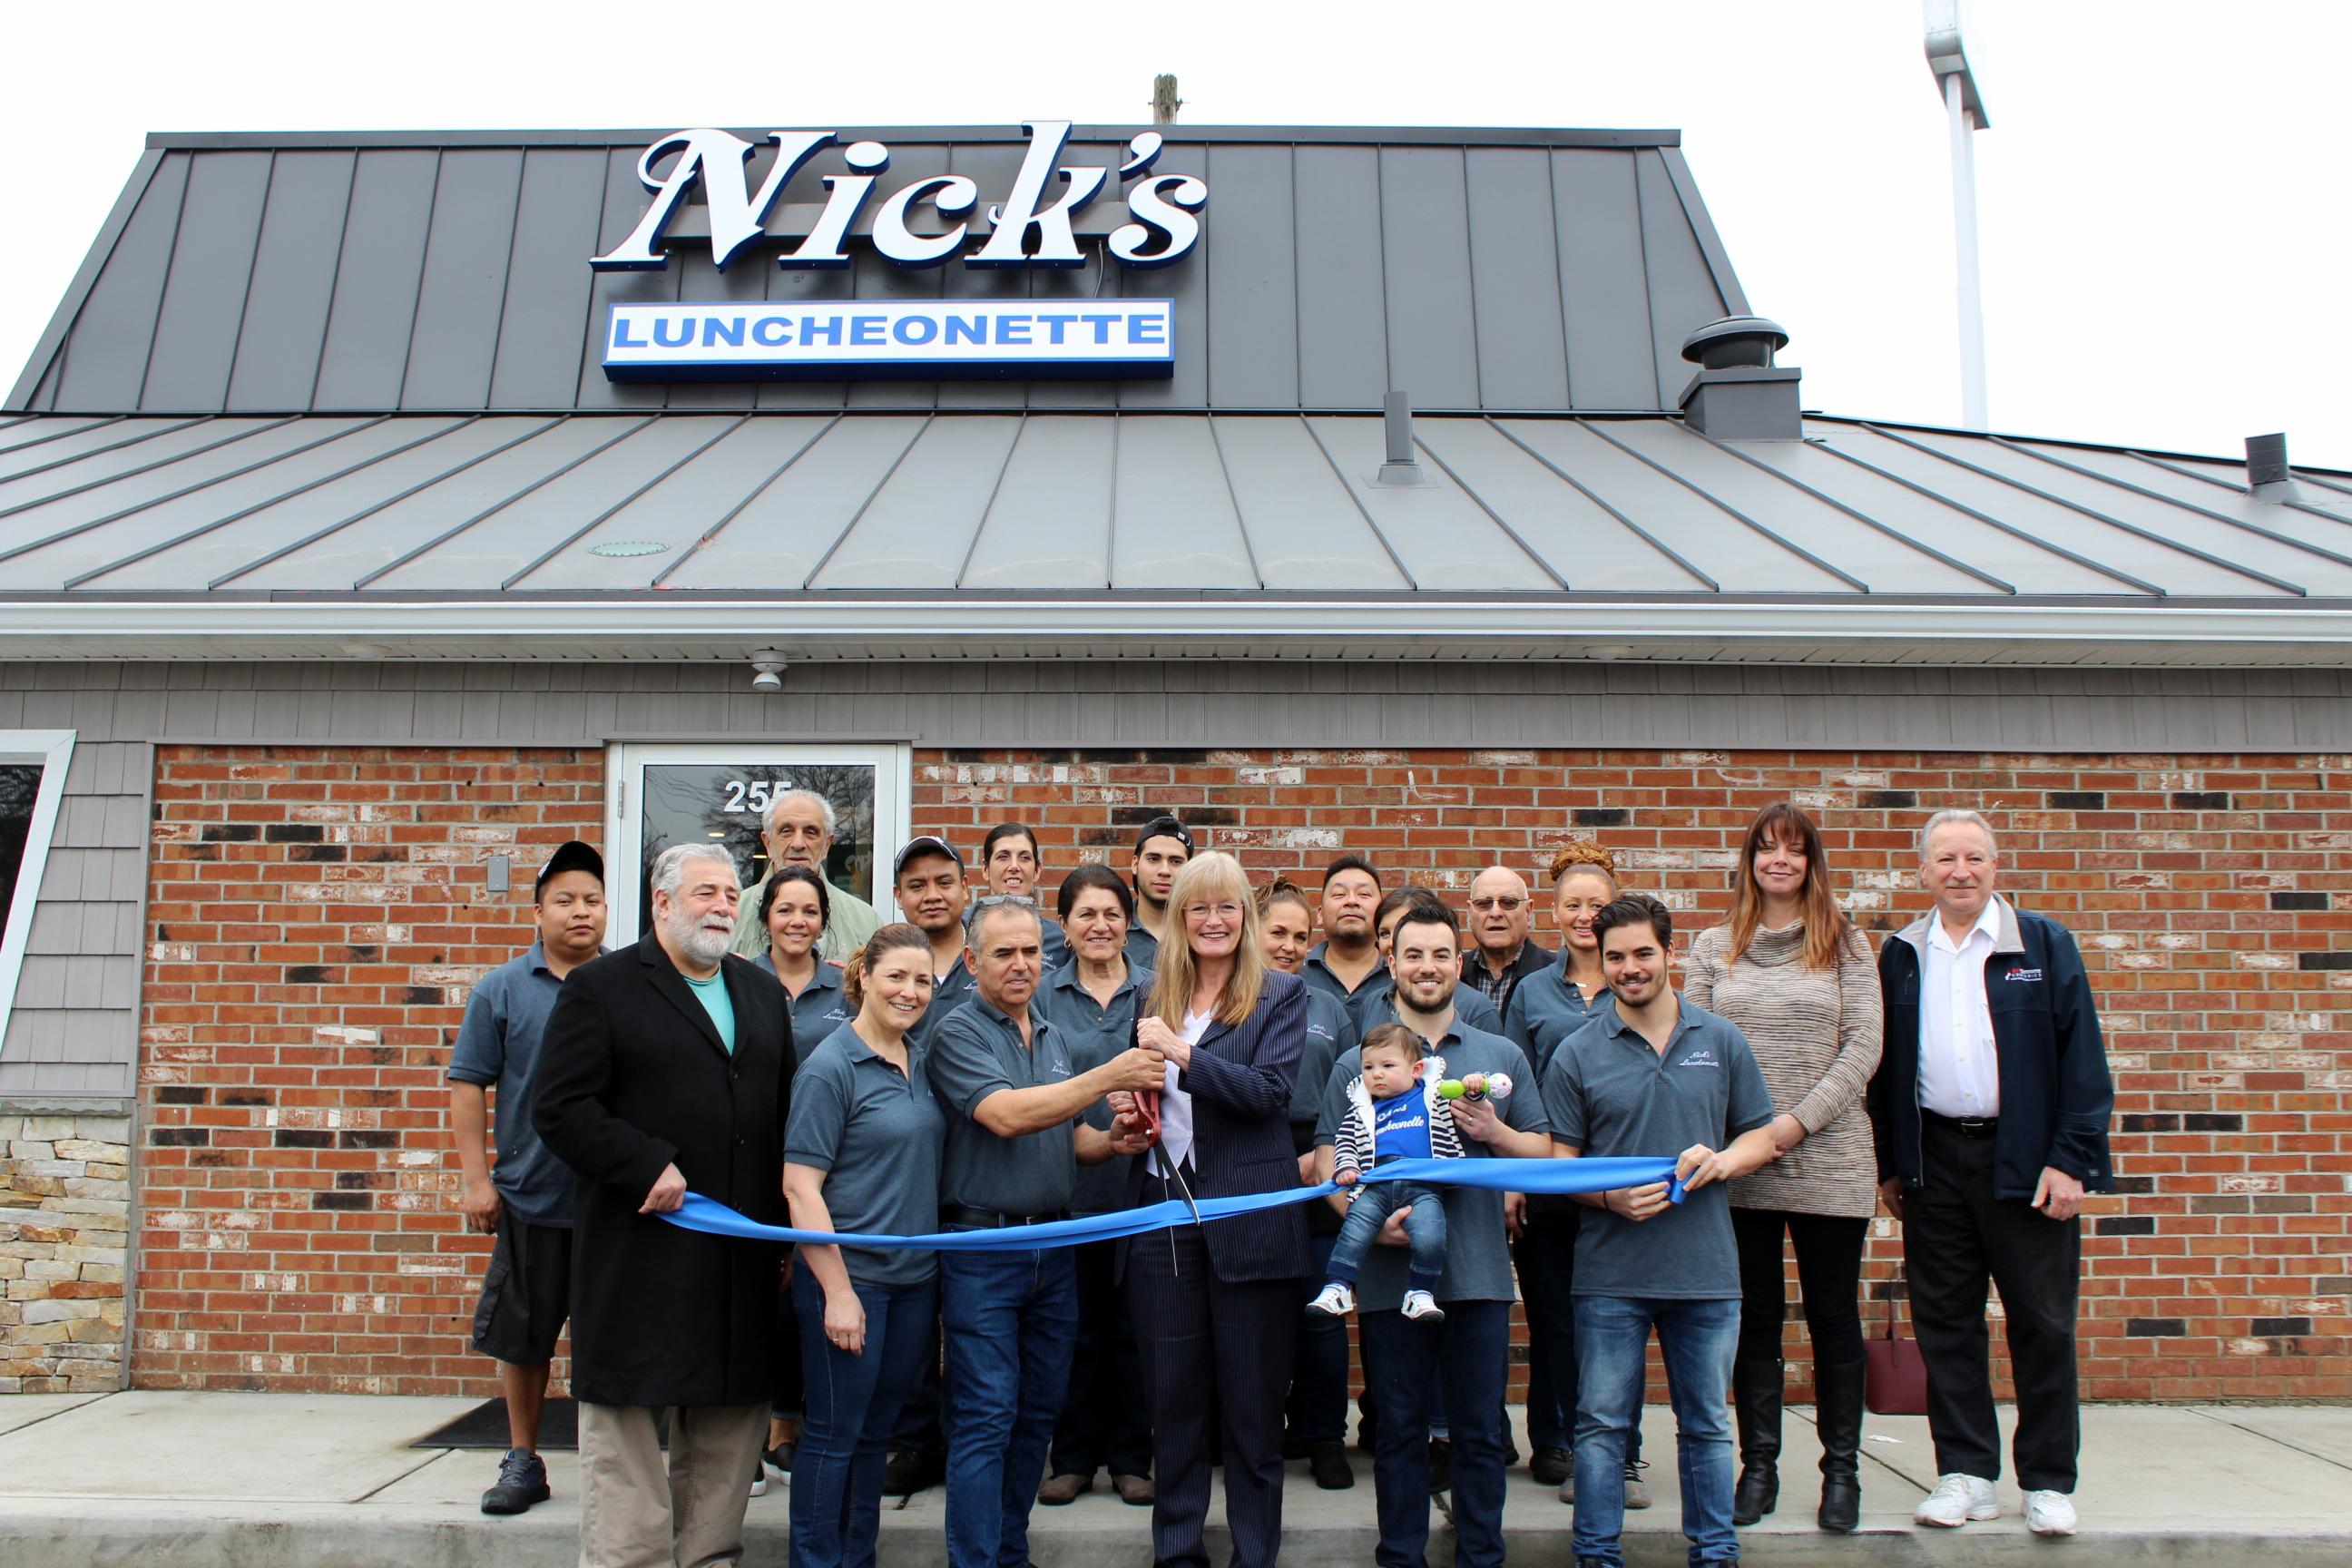 Nick's Luncheonette relocates